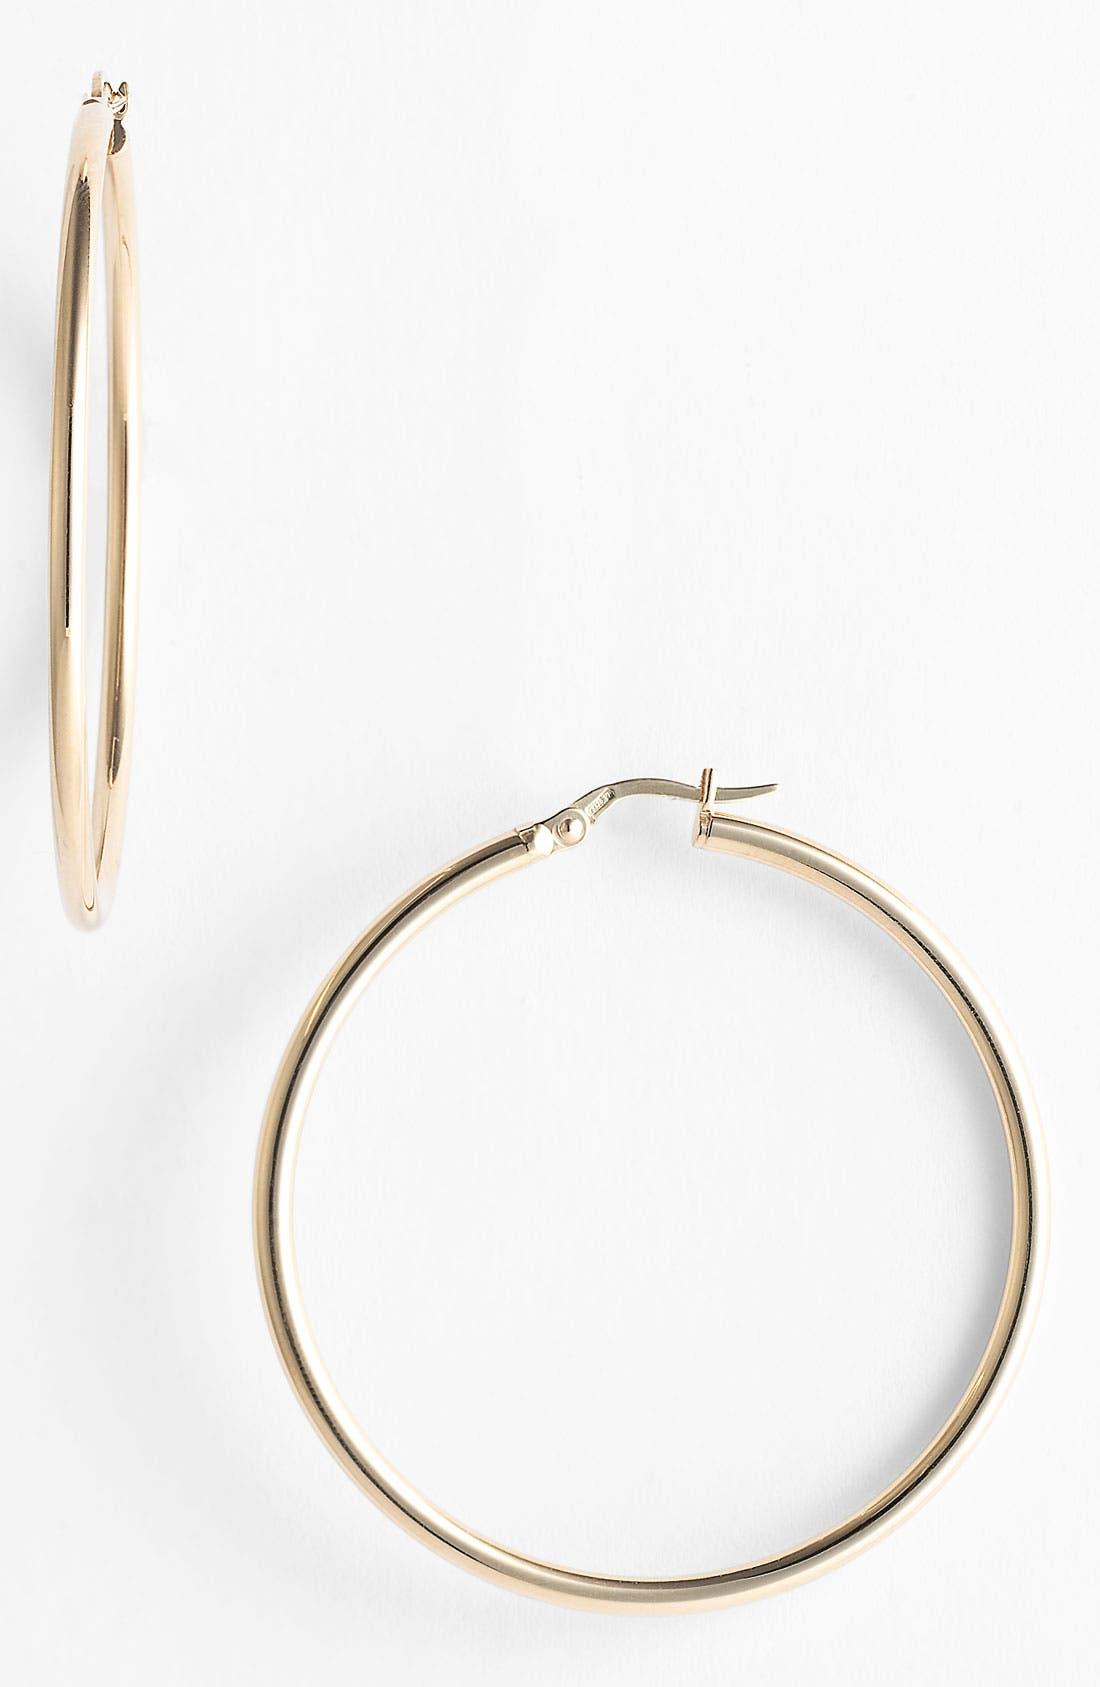 Main Image - Roberto Coin 45mm Gold Hoop Earrings